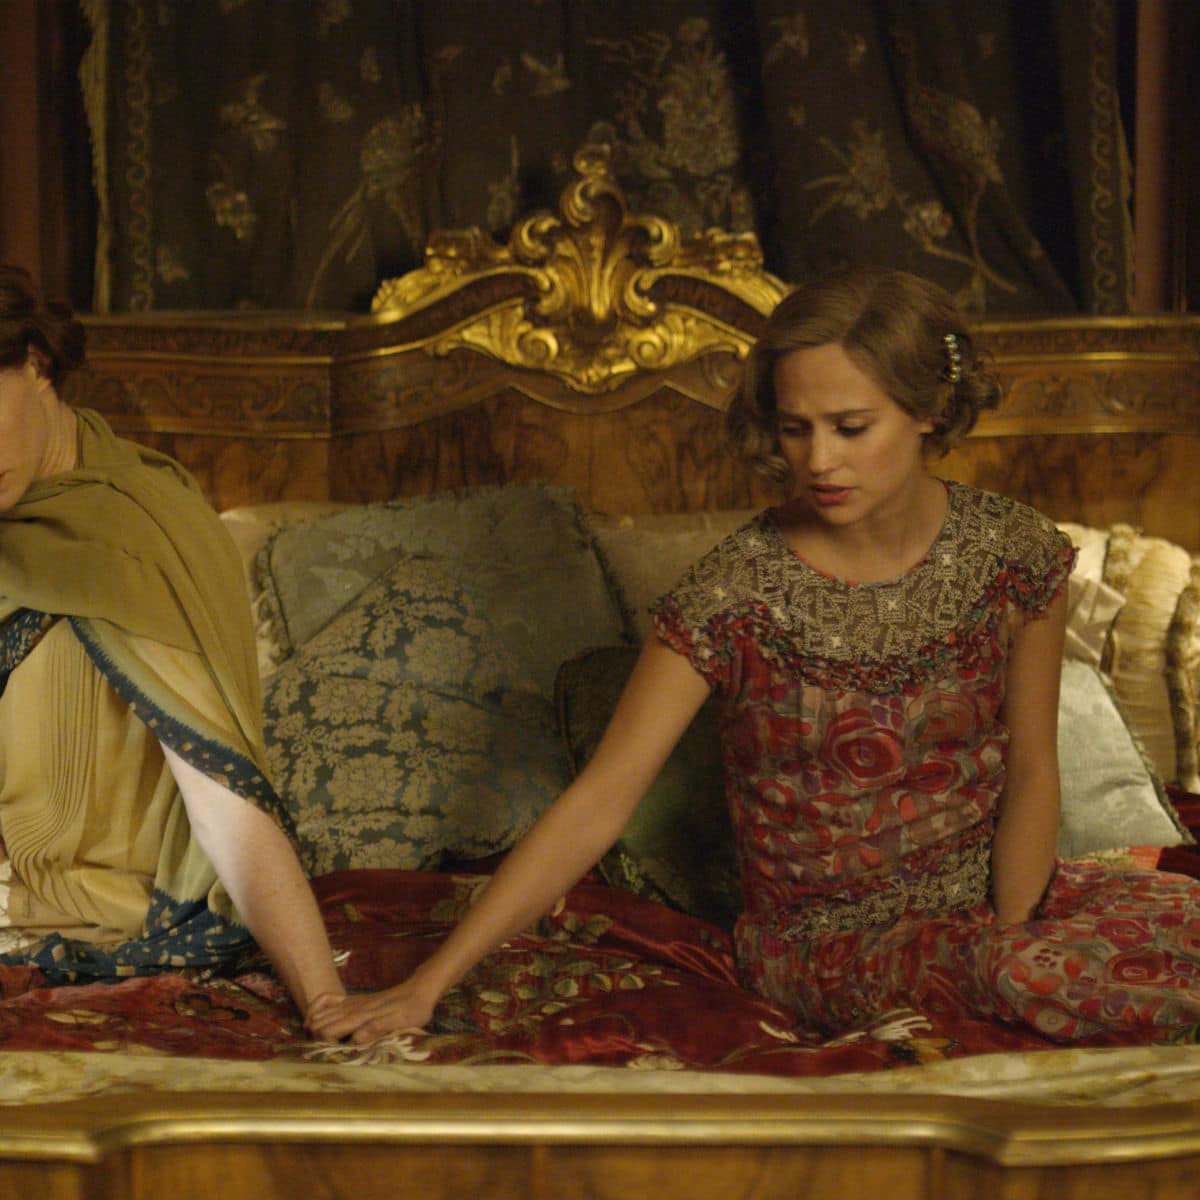 Eddie Redmayne and Alicia Vikander in The Danish Girl